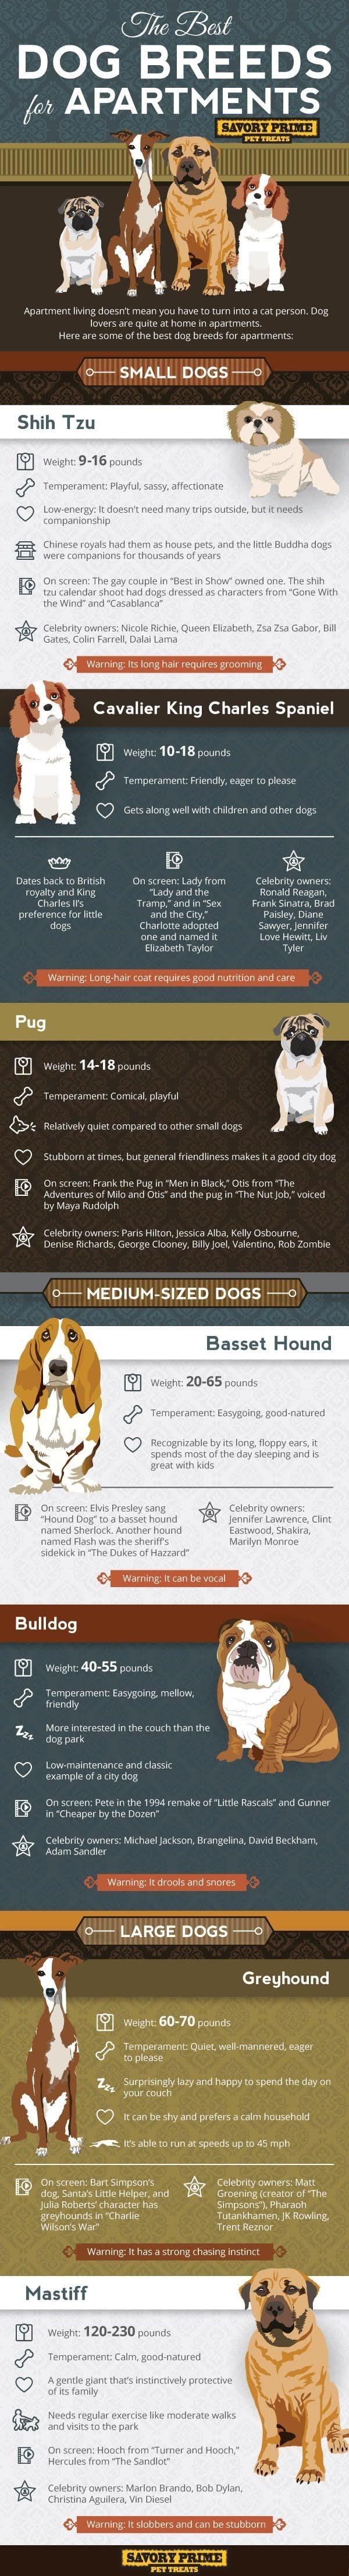 Best Breeds info